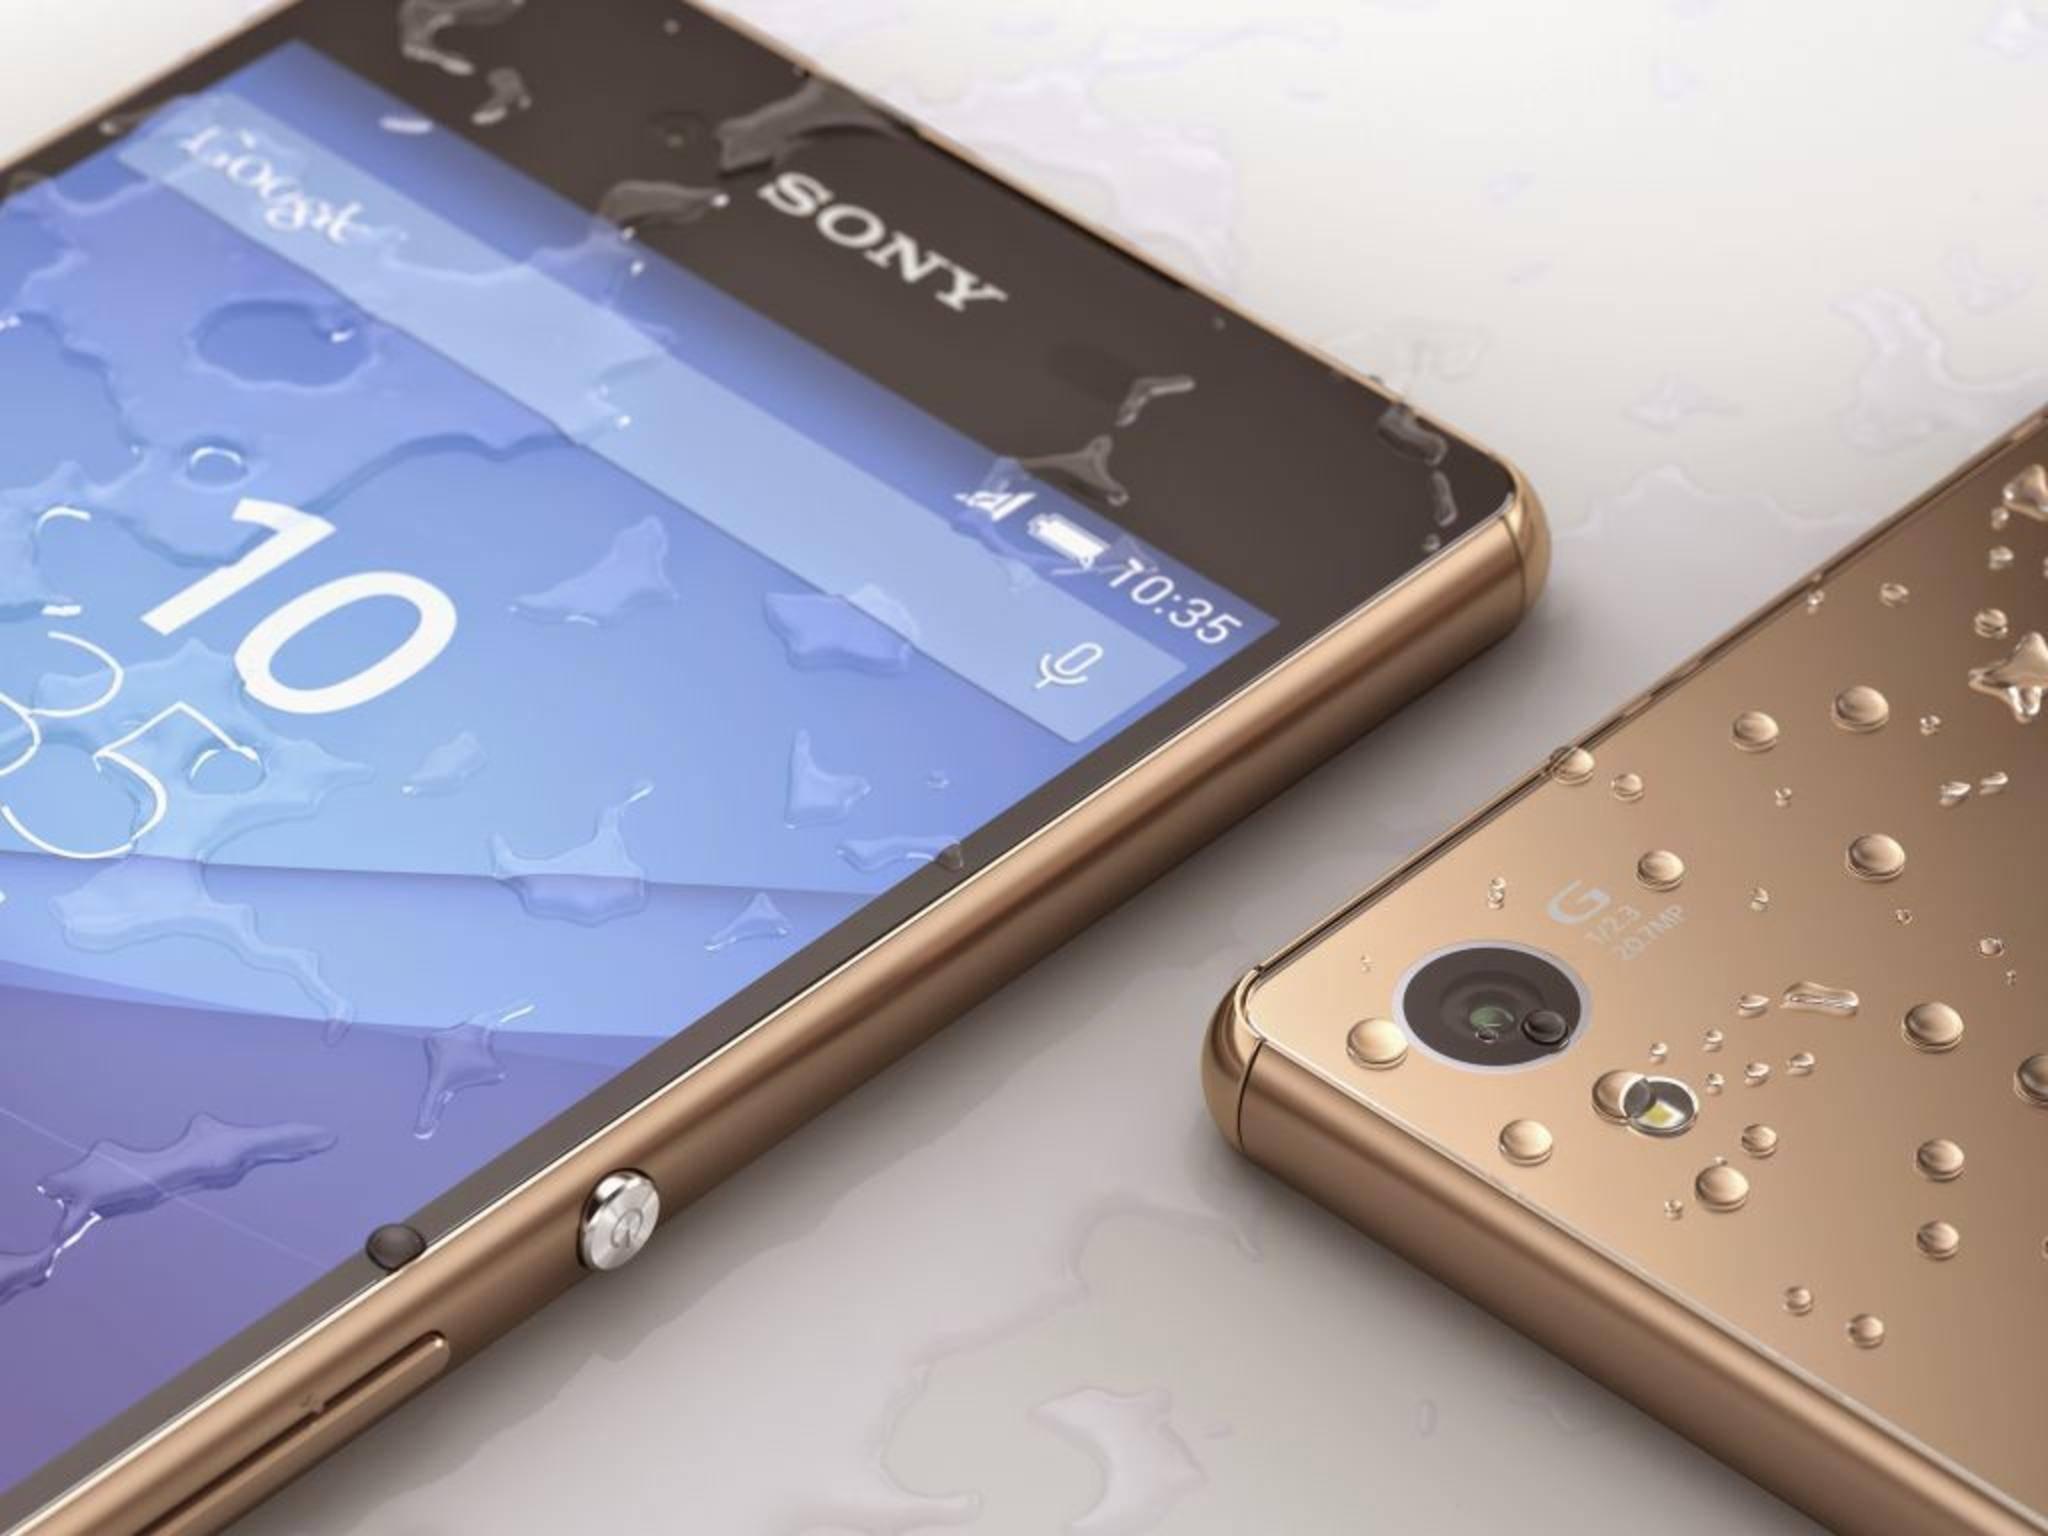 In Benchmark aufgetaucht: Sony Xperia Z4 Compact mit 3GB RAM?